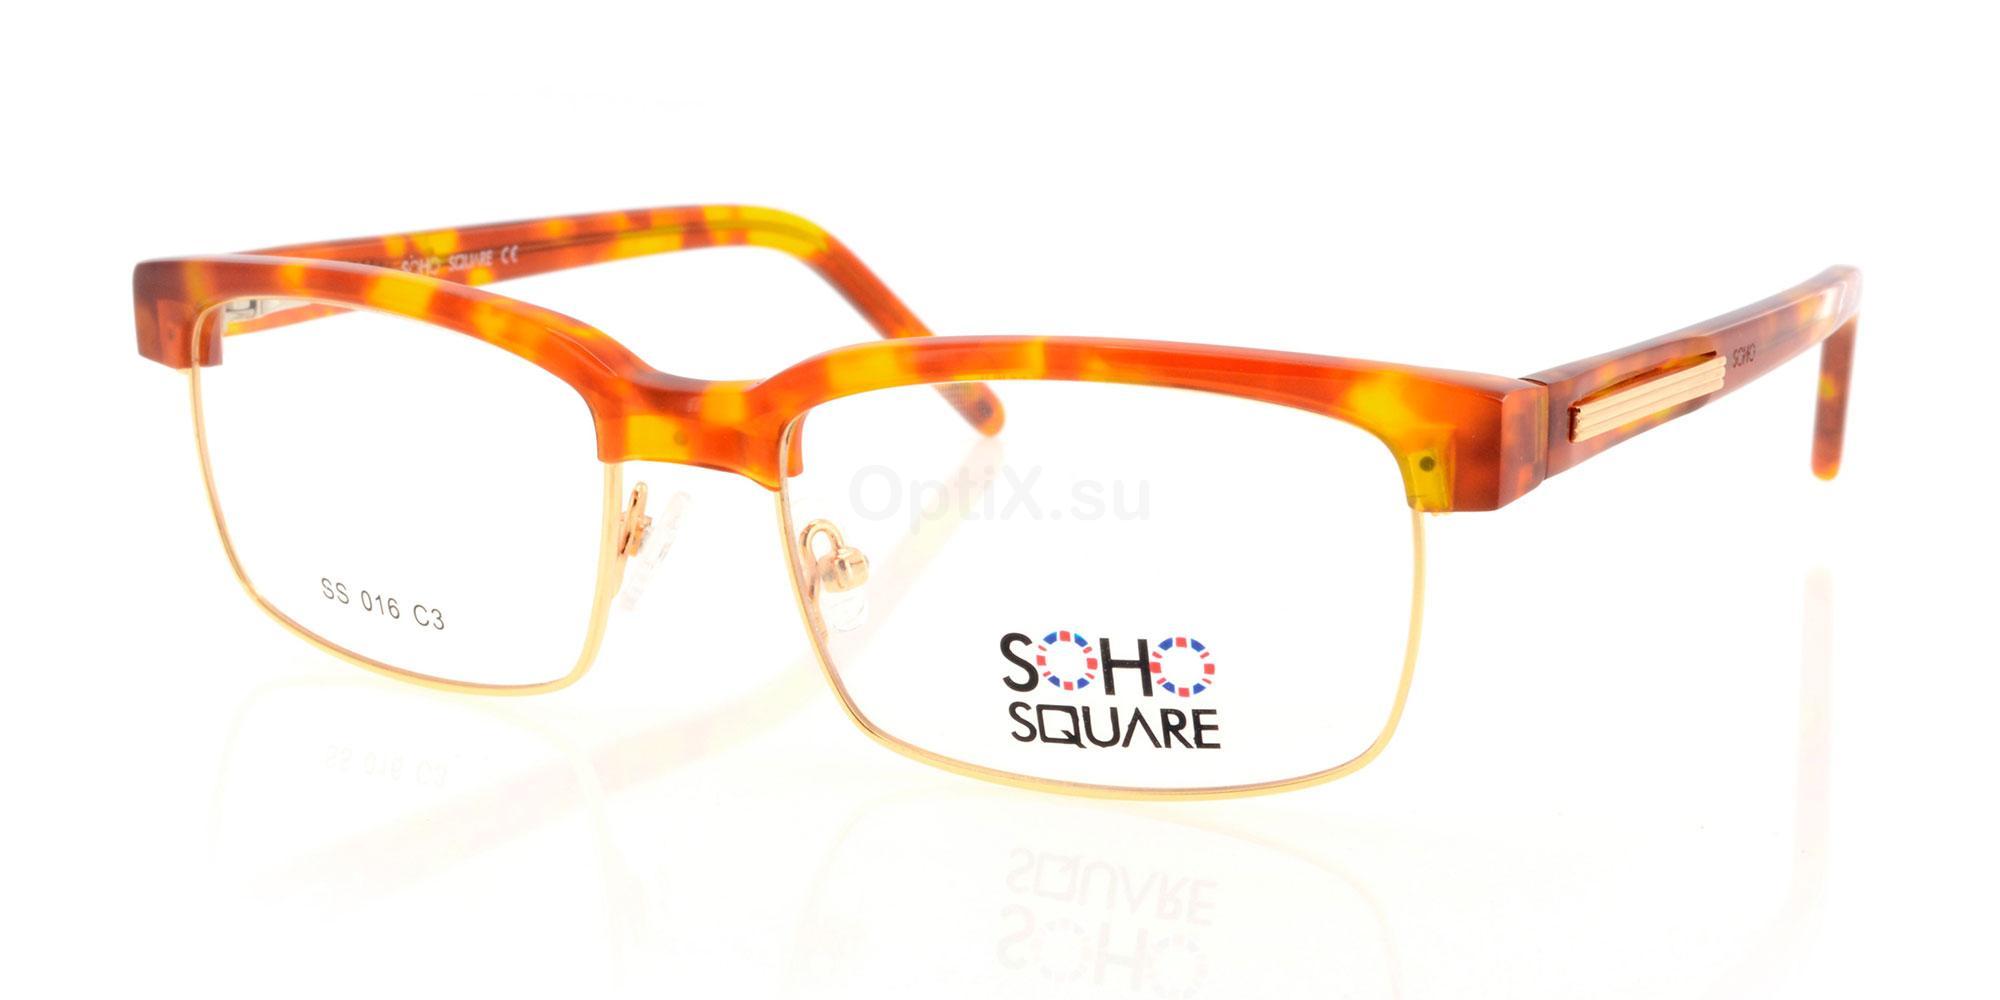 C3 SS 016 Glasses, Soho Square